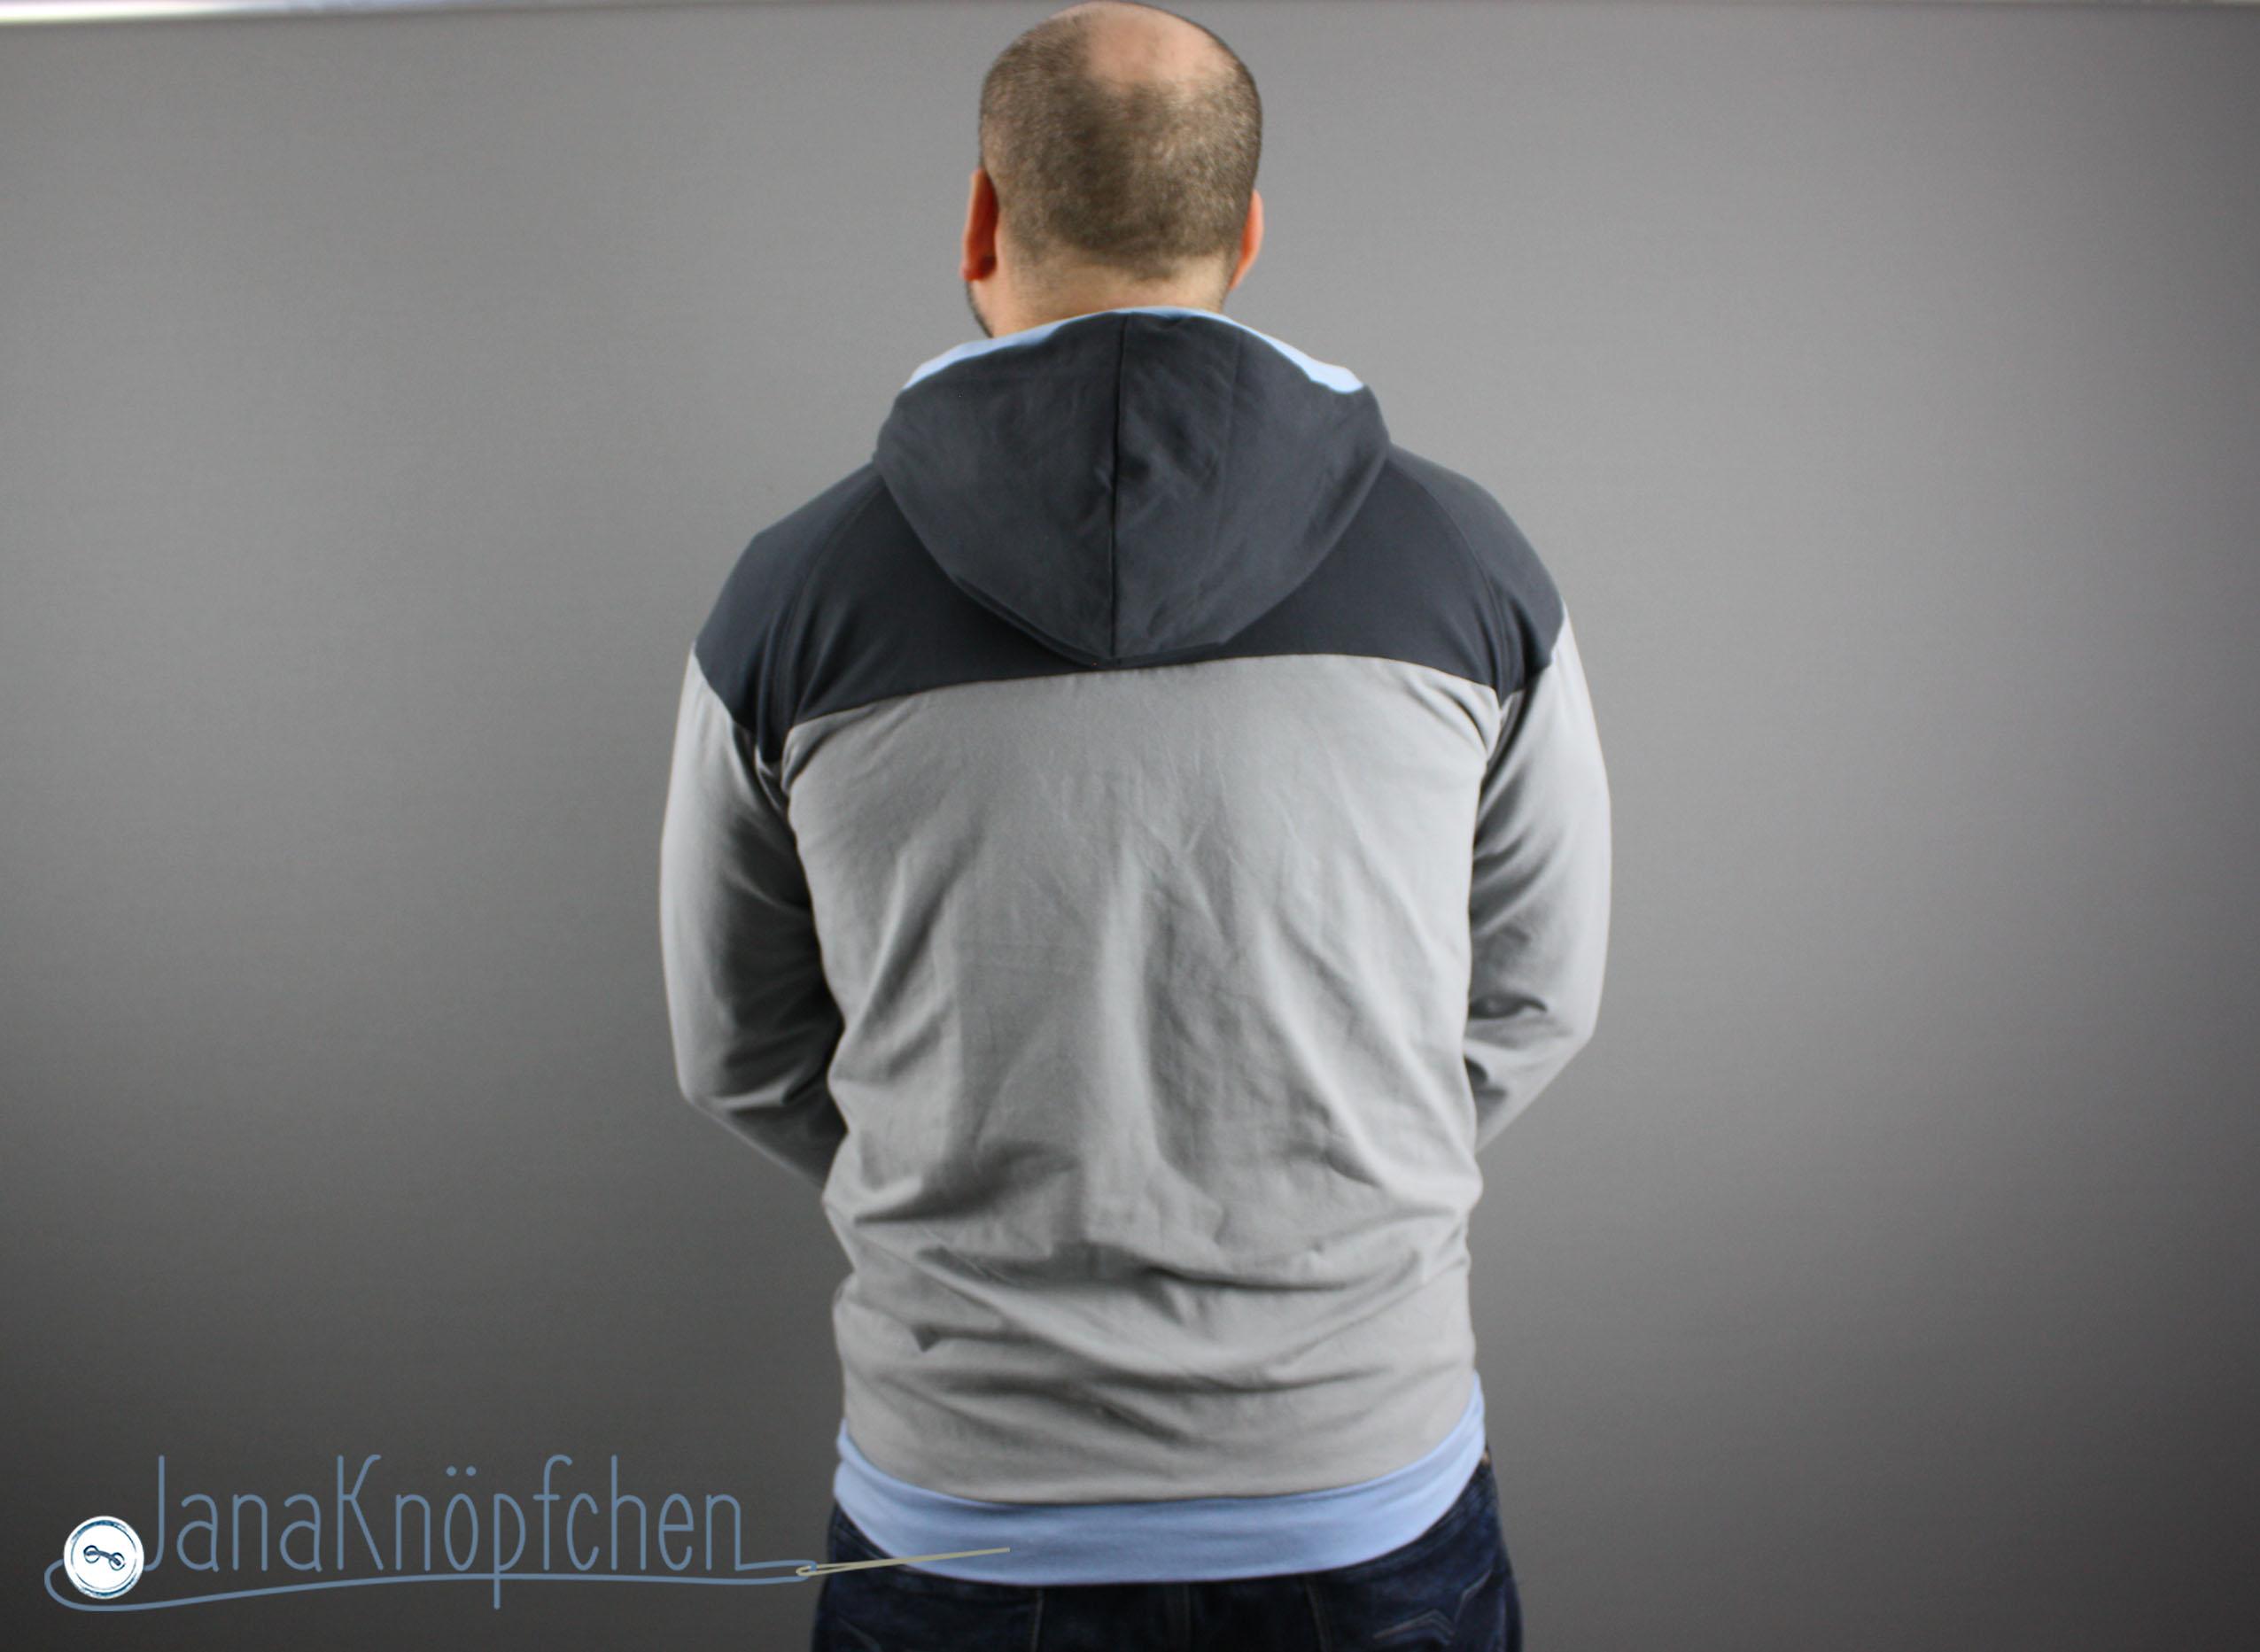 Shirt für Männer selbstgenaeht. JanaKnöpfchen. Nähen für Jungs - Nähblog